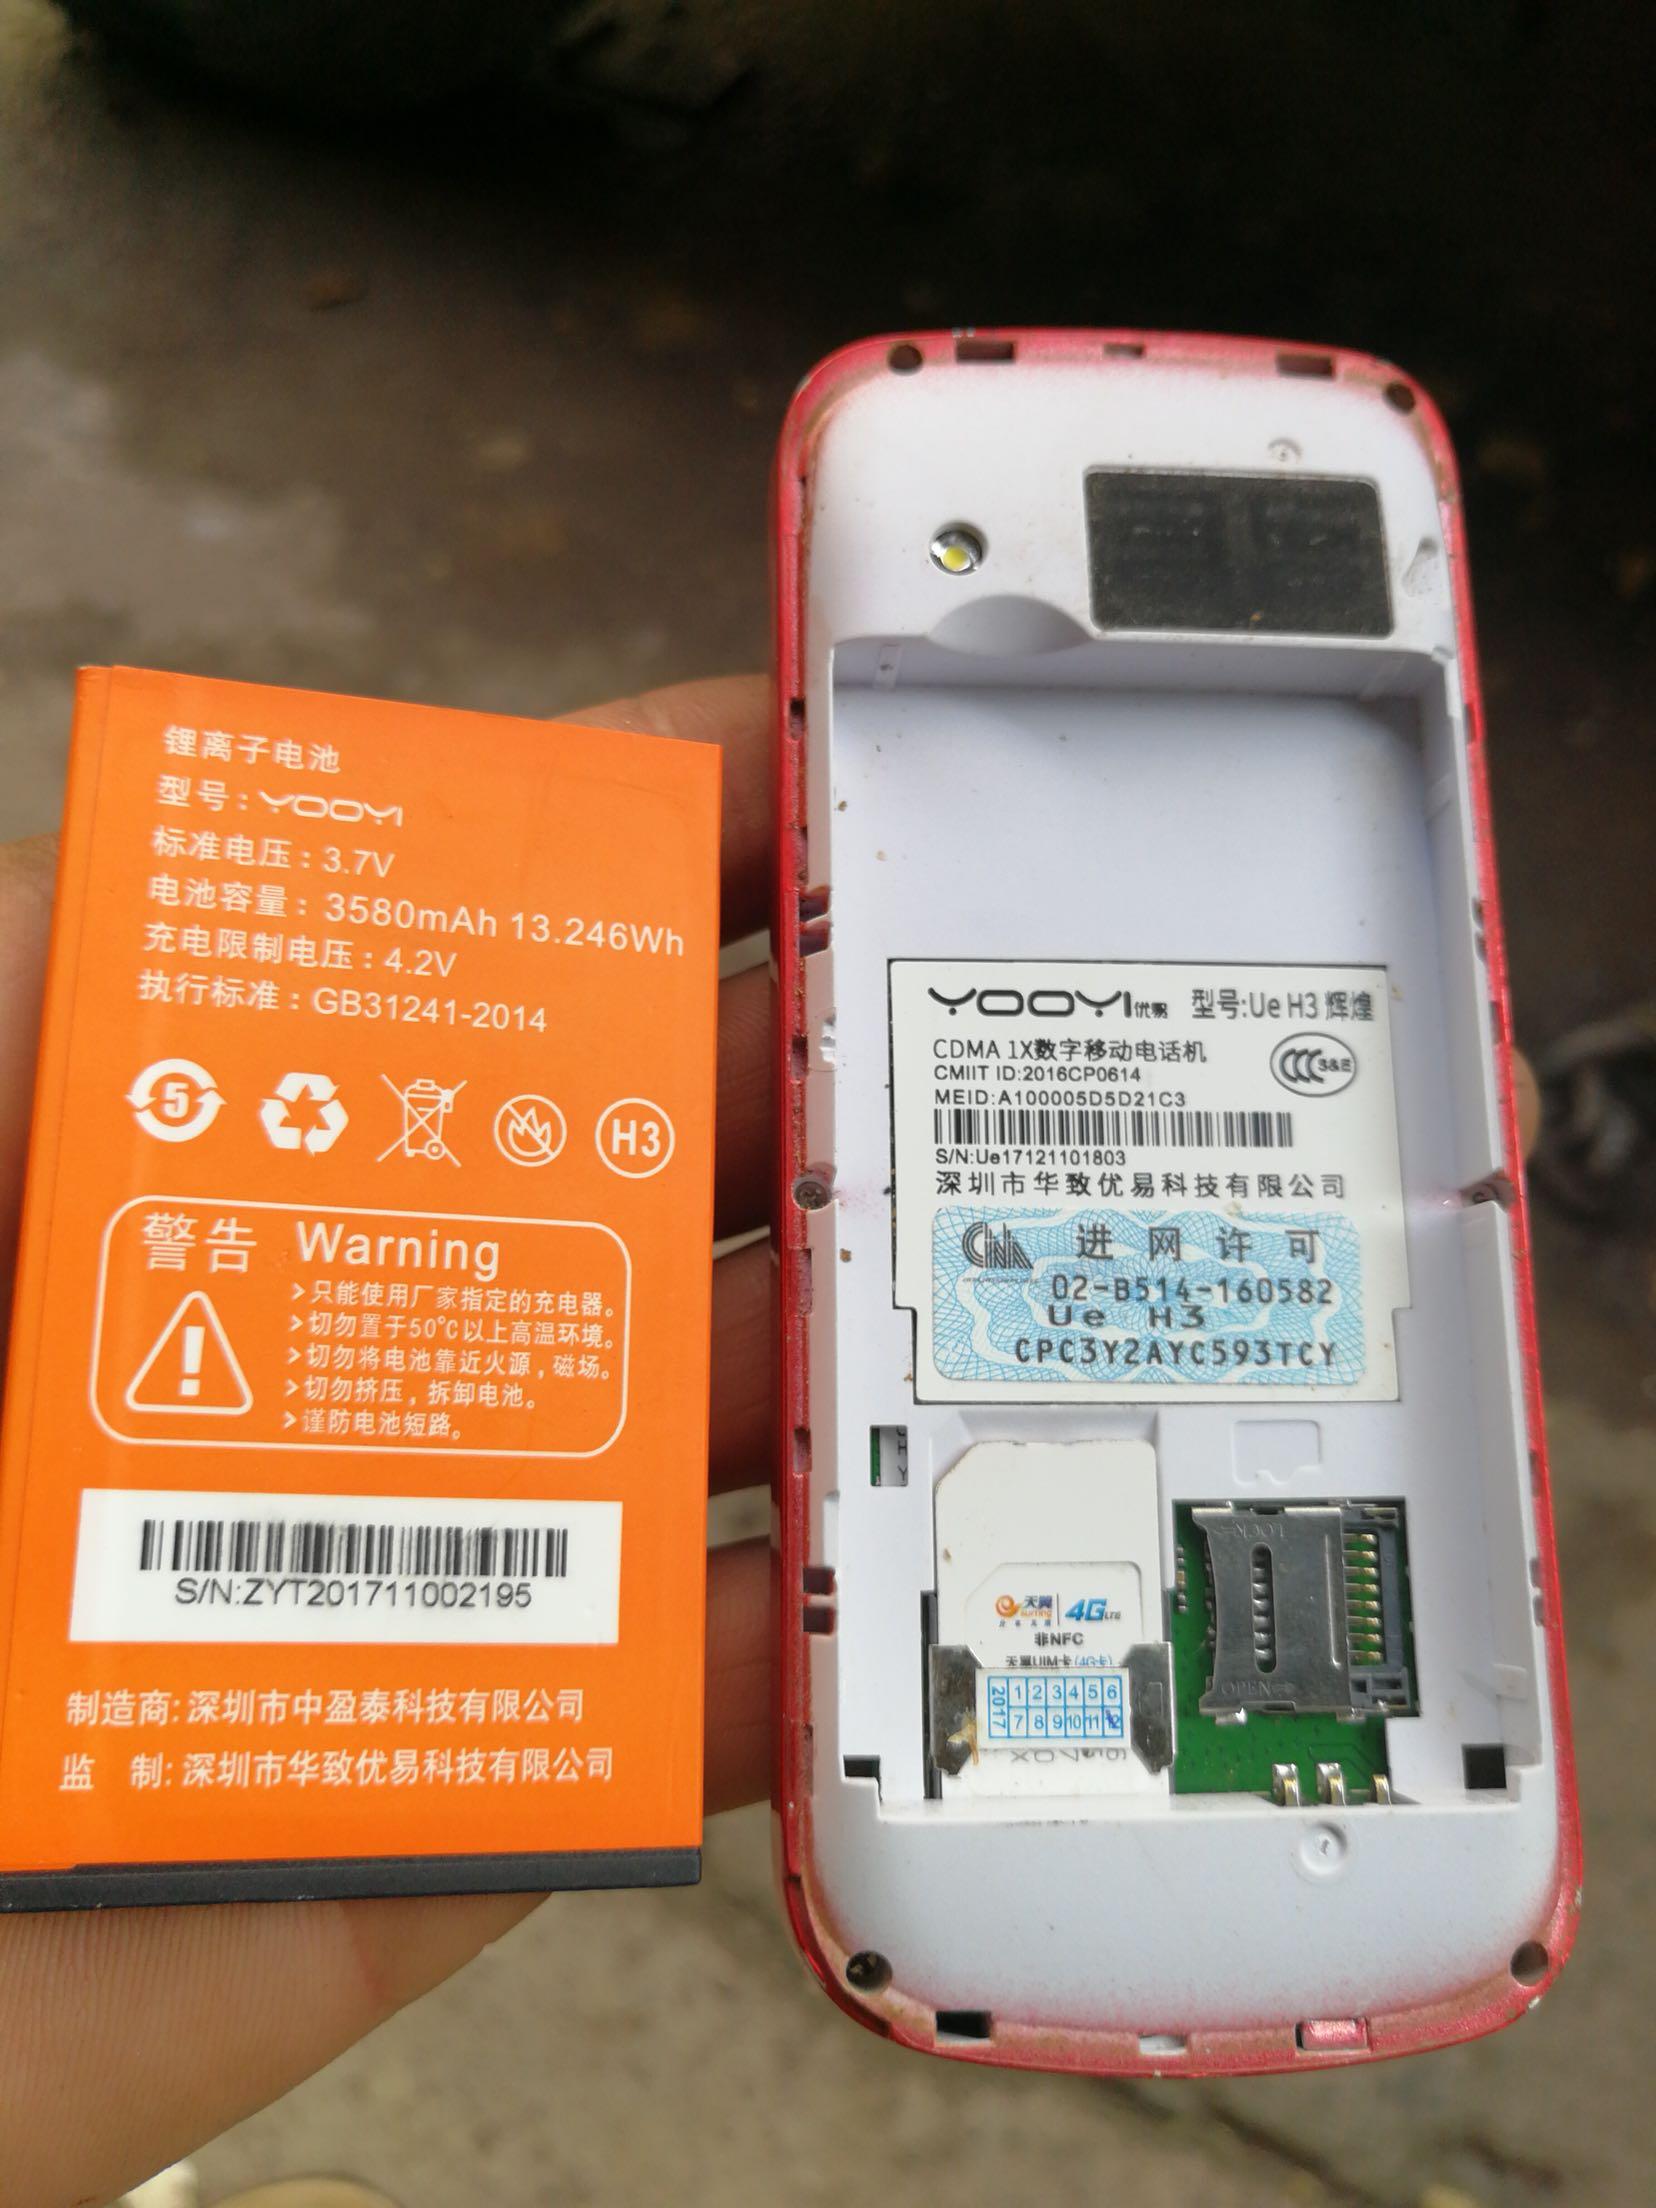 YOOYI 优易 Ue H3 辉煌手机电池 yooyi UeH3 电板 3580mAh